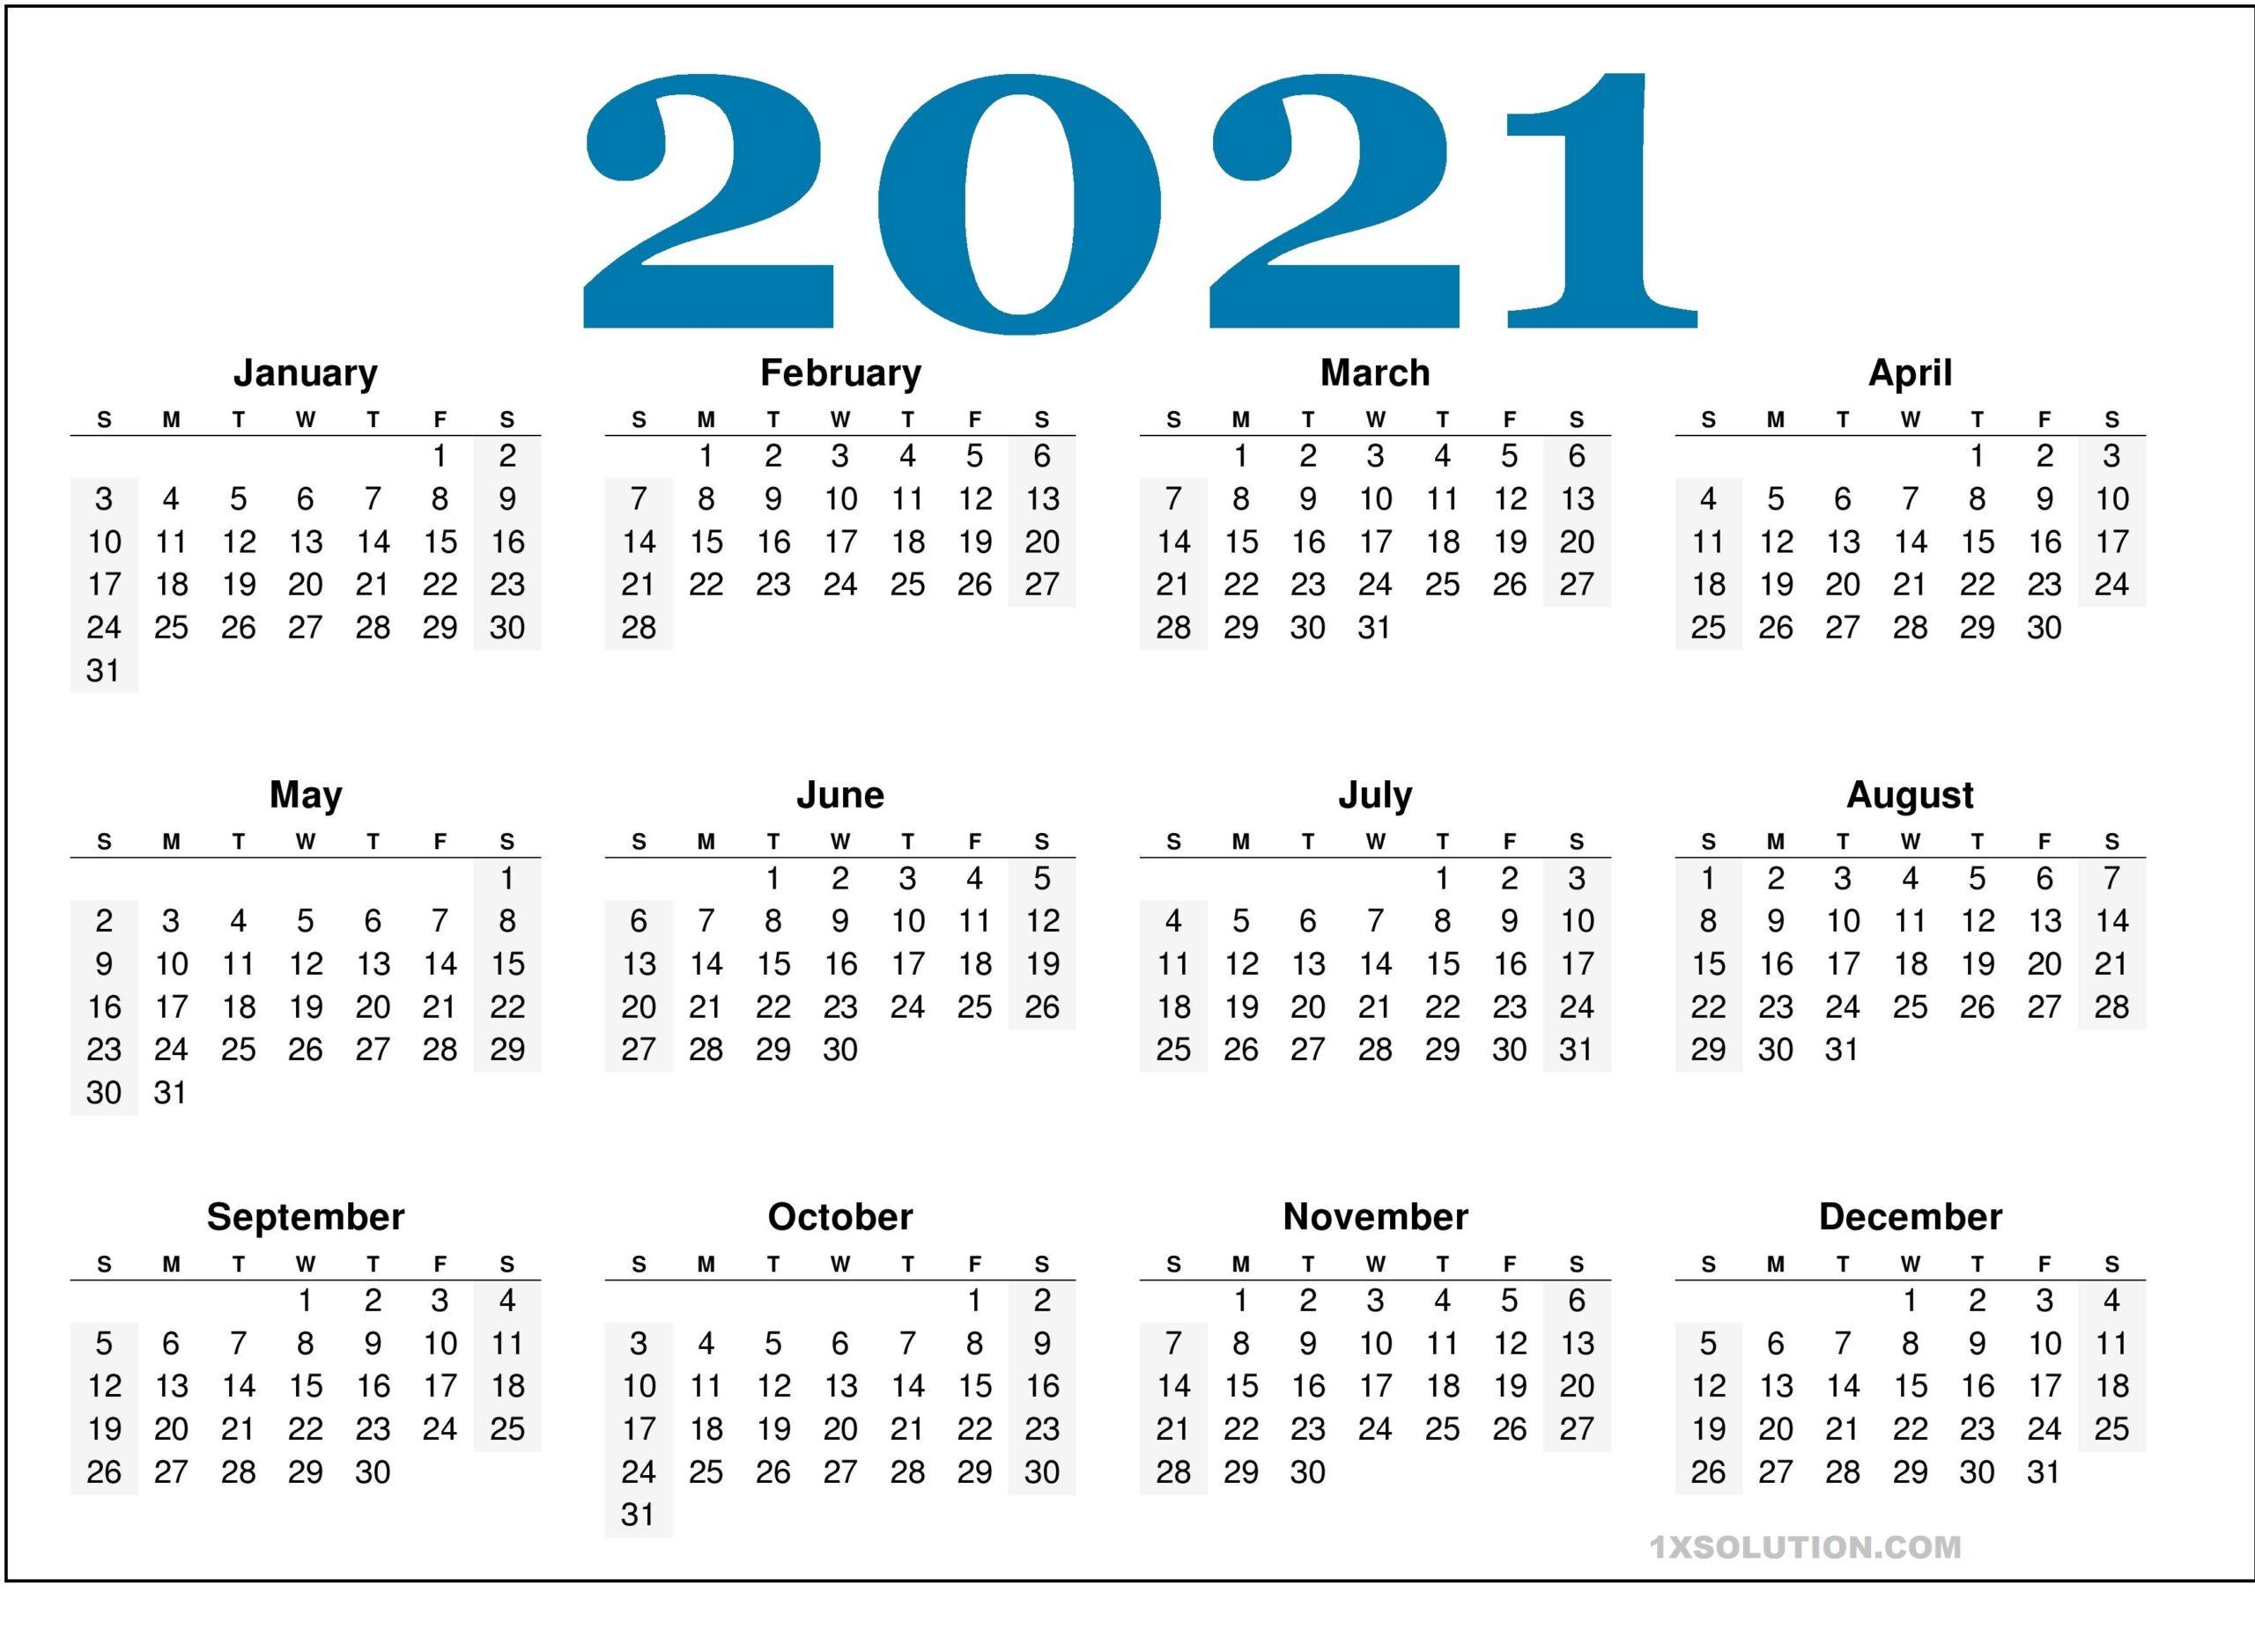 2021 Daily Calendar Excel sheet